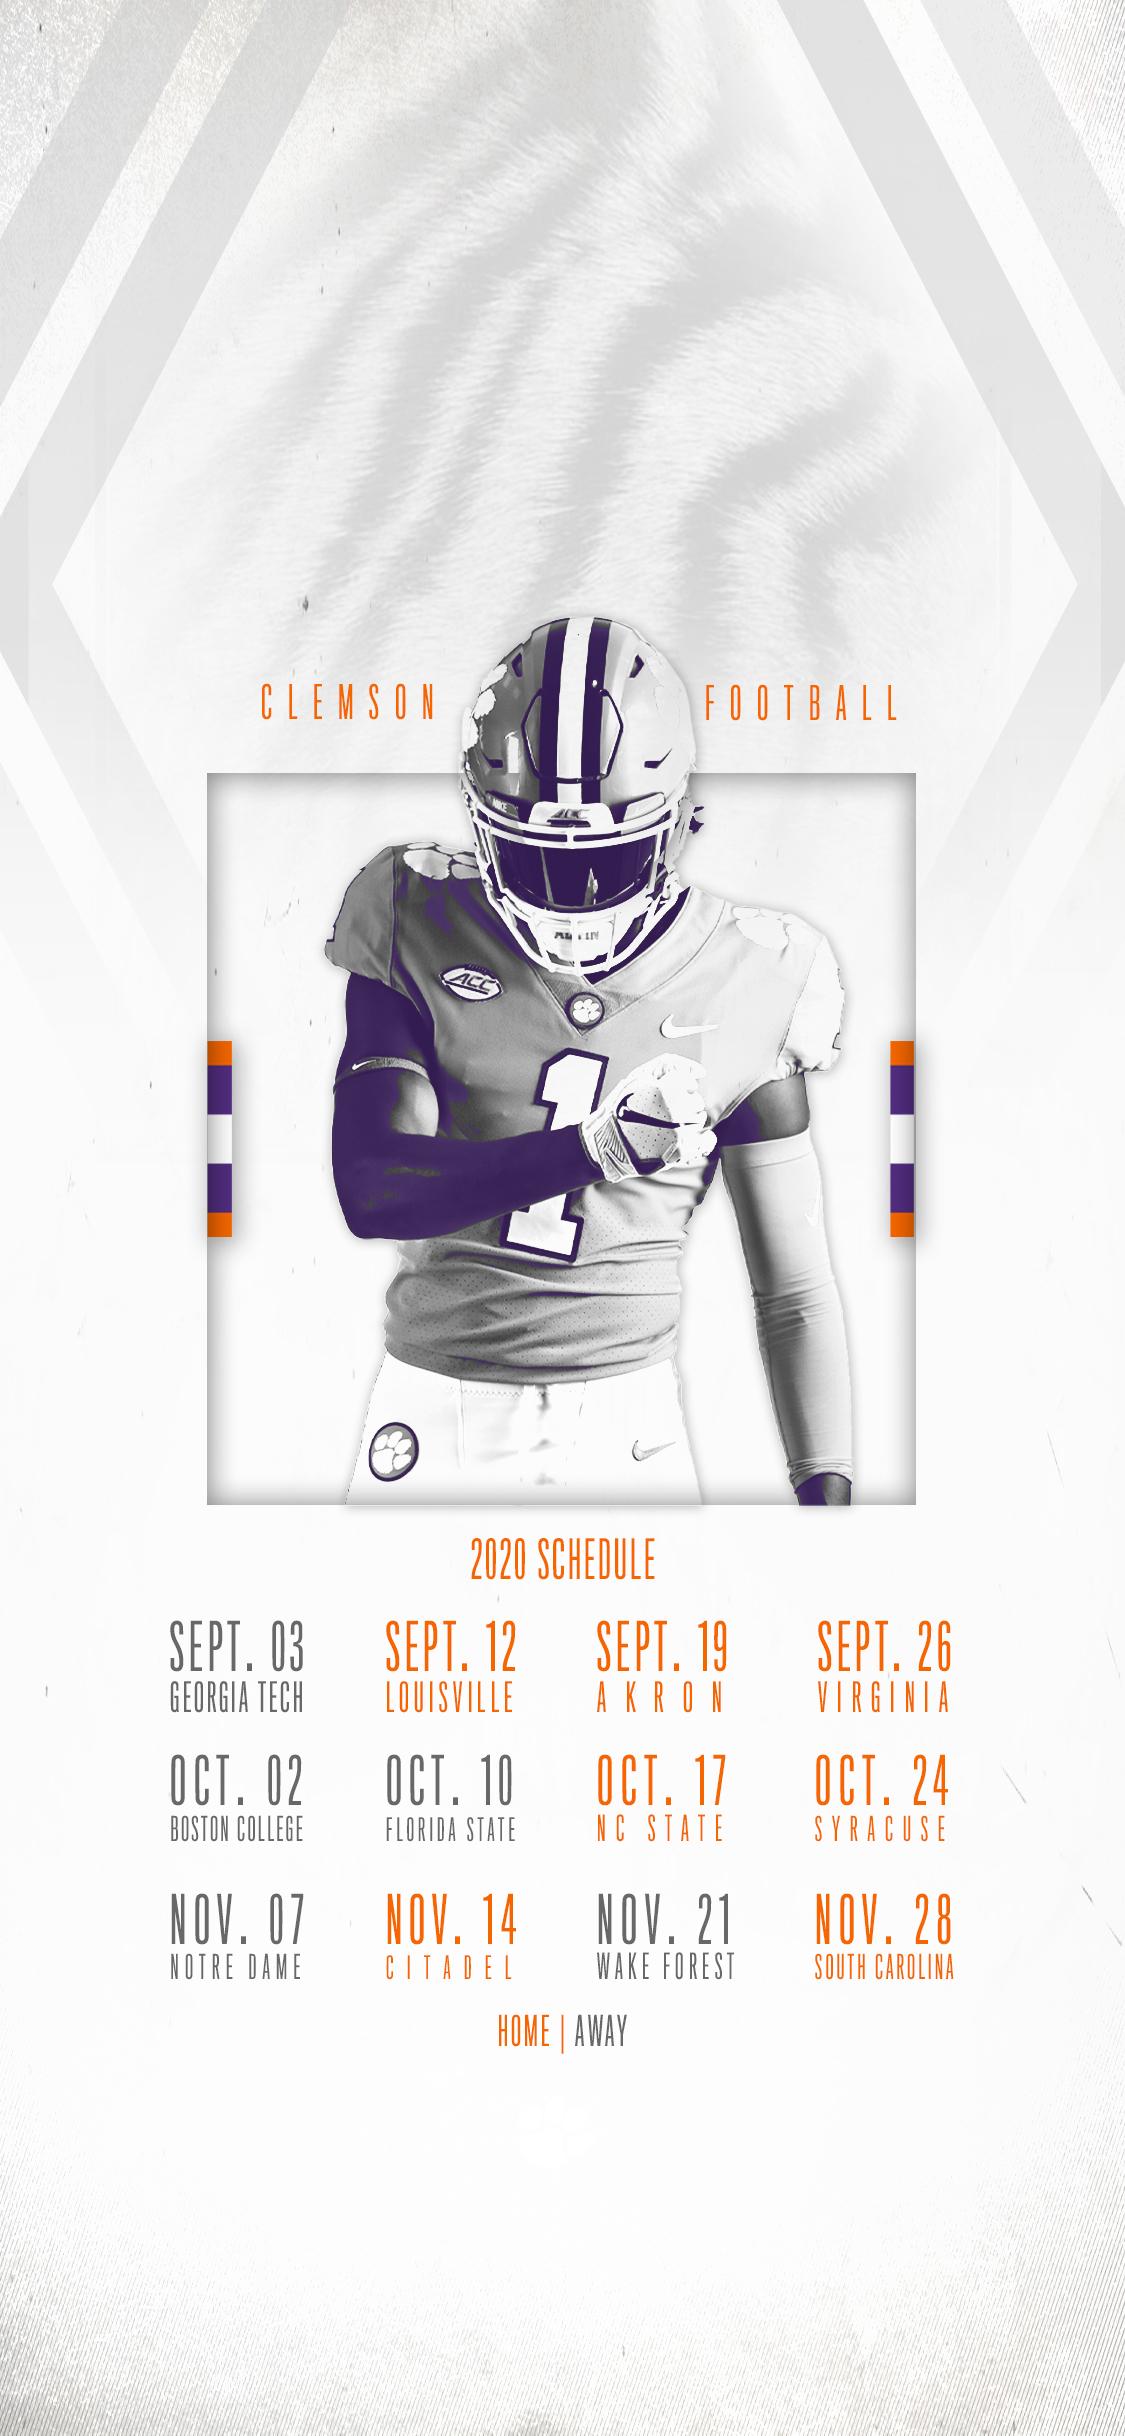 Clemson Announces 2020 Football Schedule – Clemson Tigers